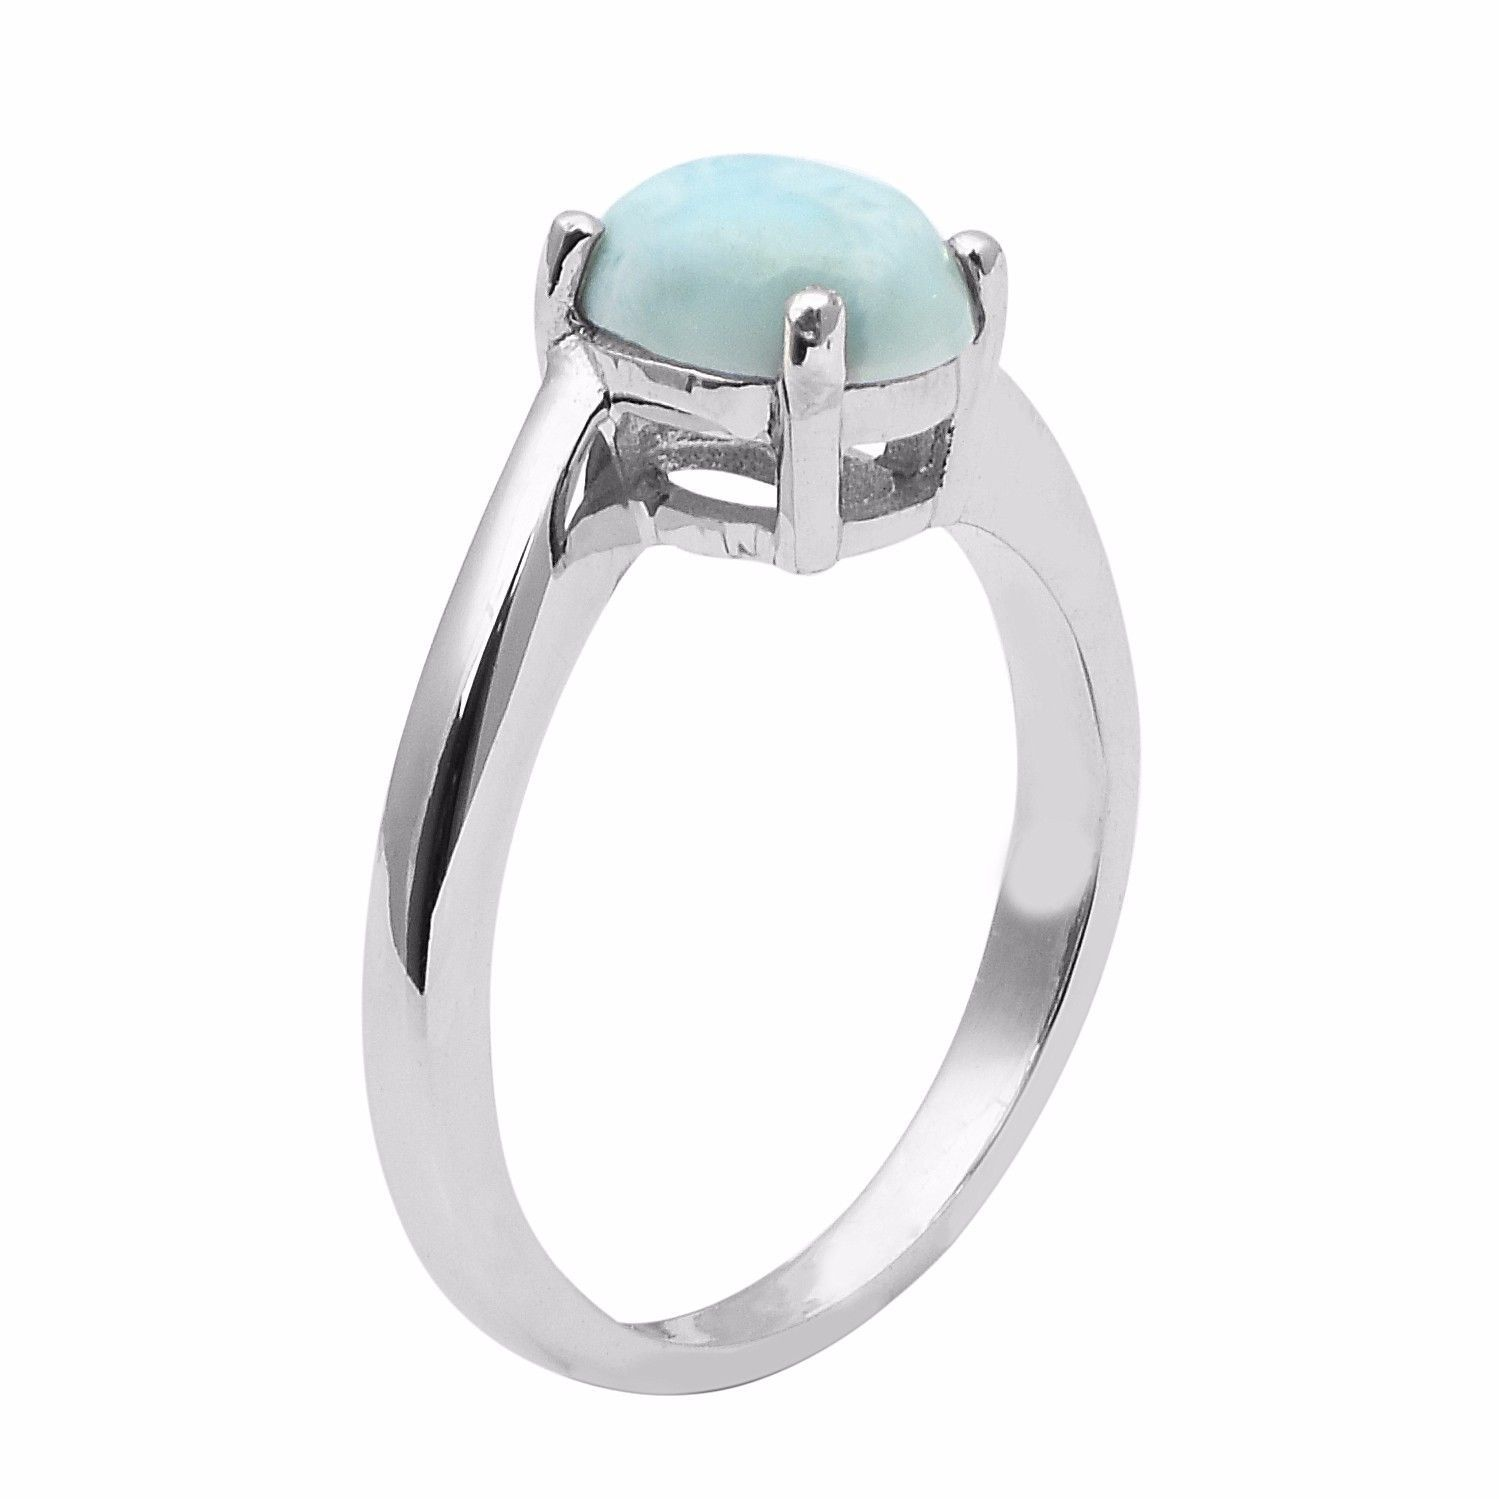 2.10 Carat Oval Shape Gemstone Sterling Larimar Gemstone Ring Sz 8 SHRI0949